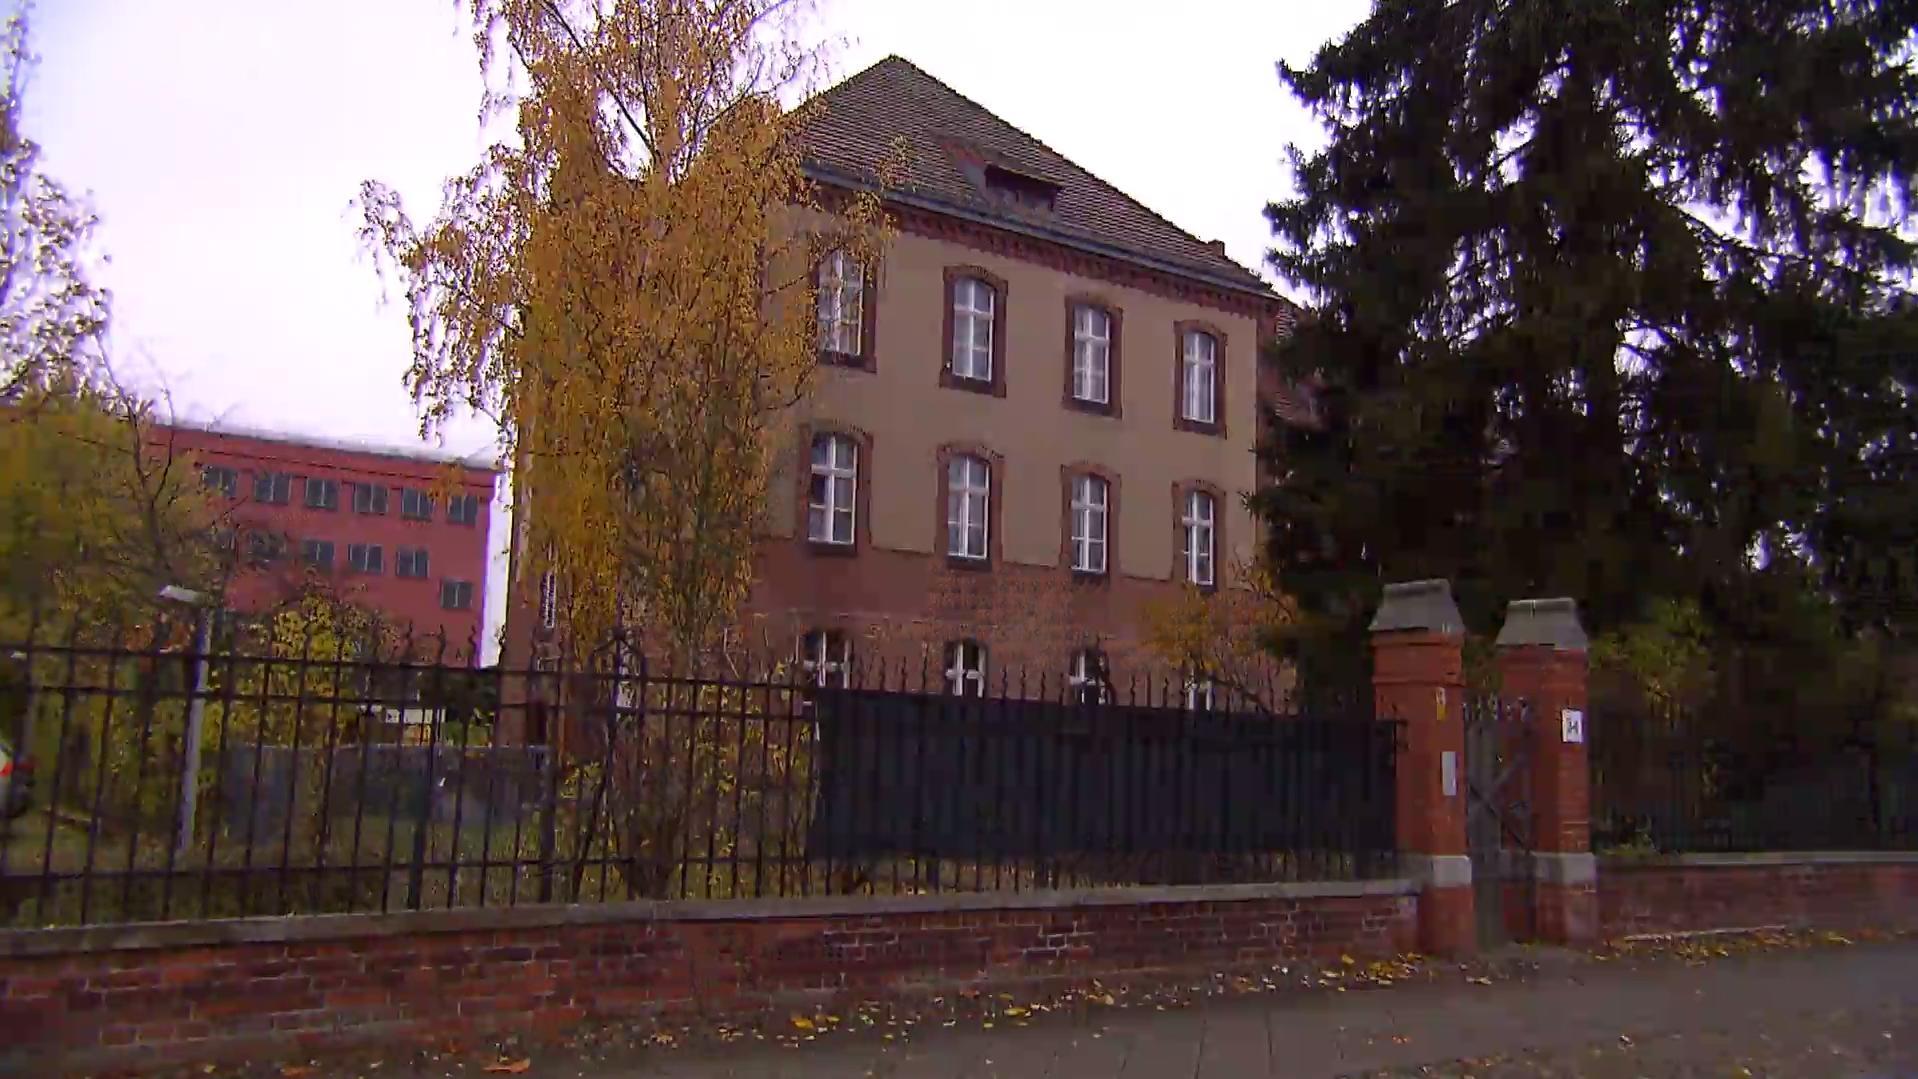 Berlin: Schwerverbrecher in Sicherungsverwahrung sollen Freigang bekommen